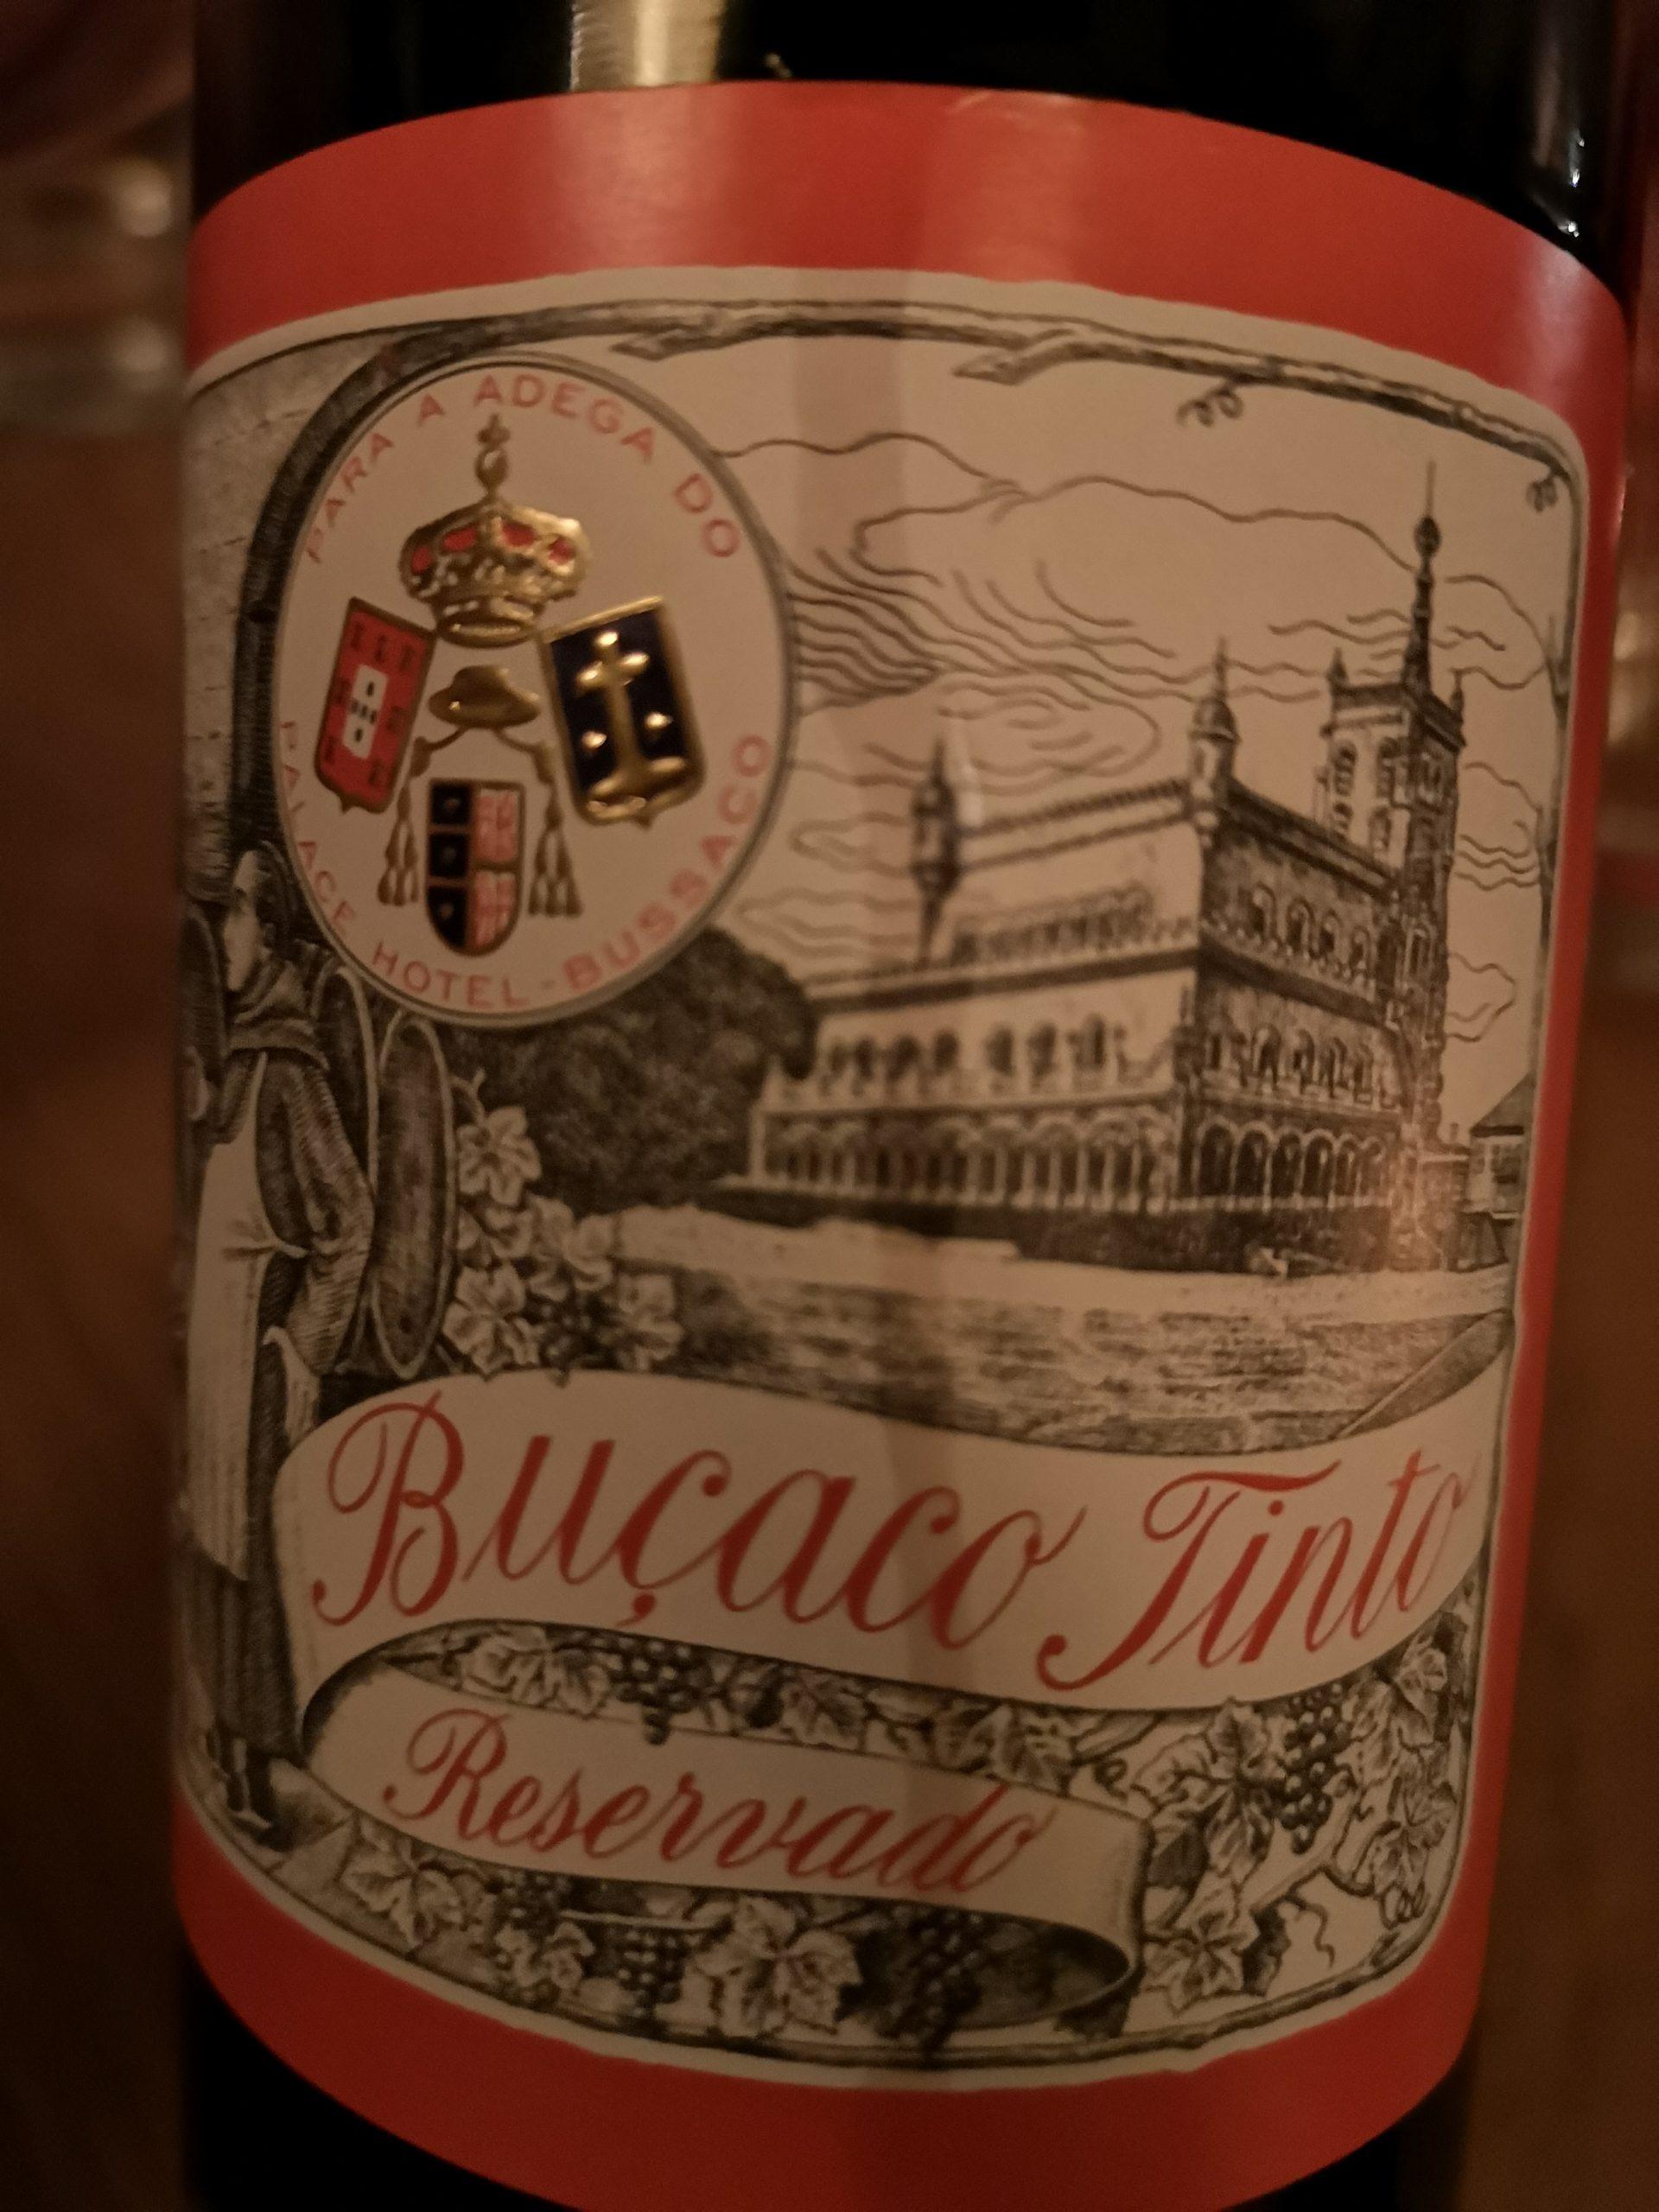 2000 Buçaco Tinto Reservado | Buçaco